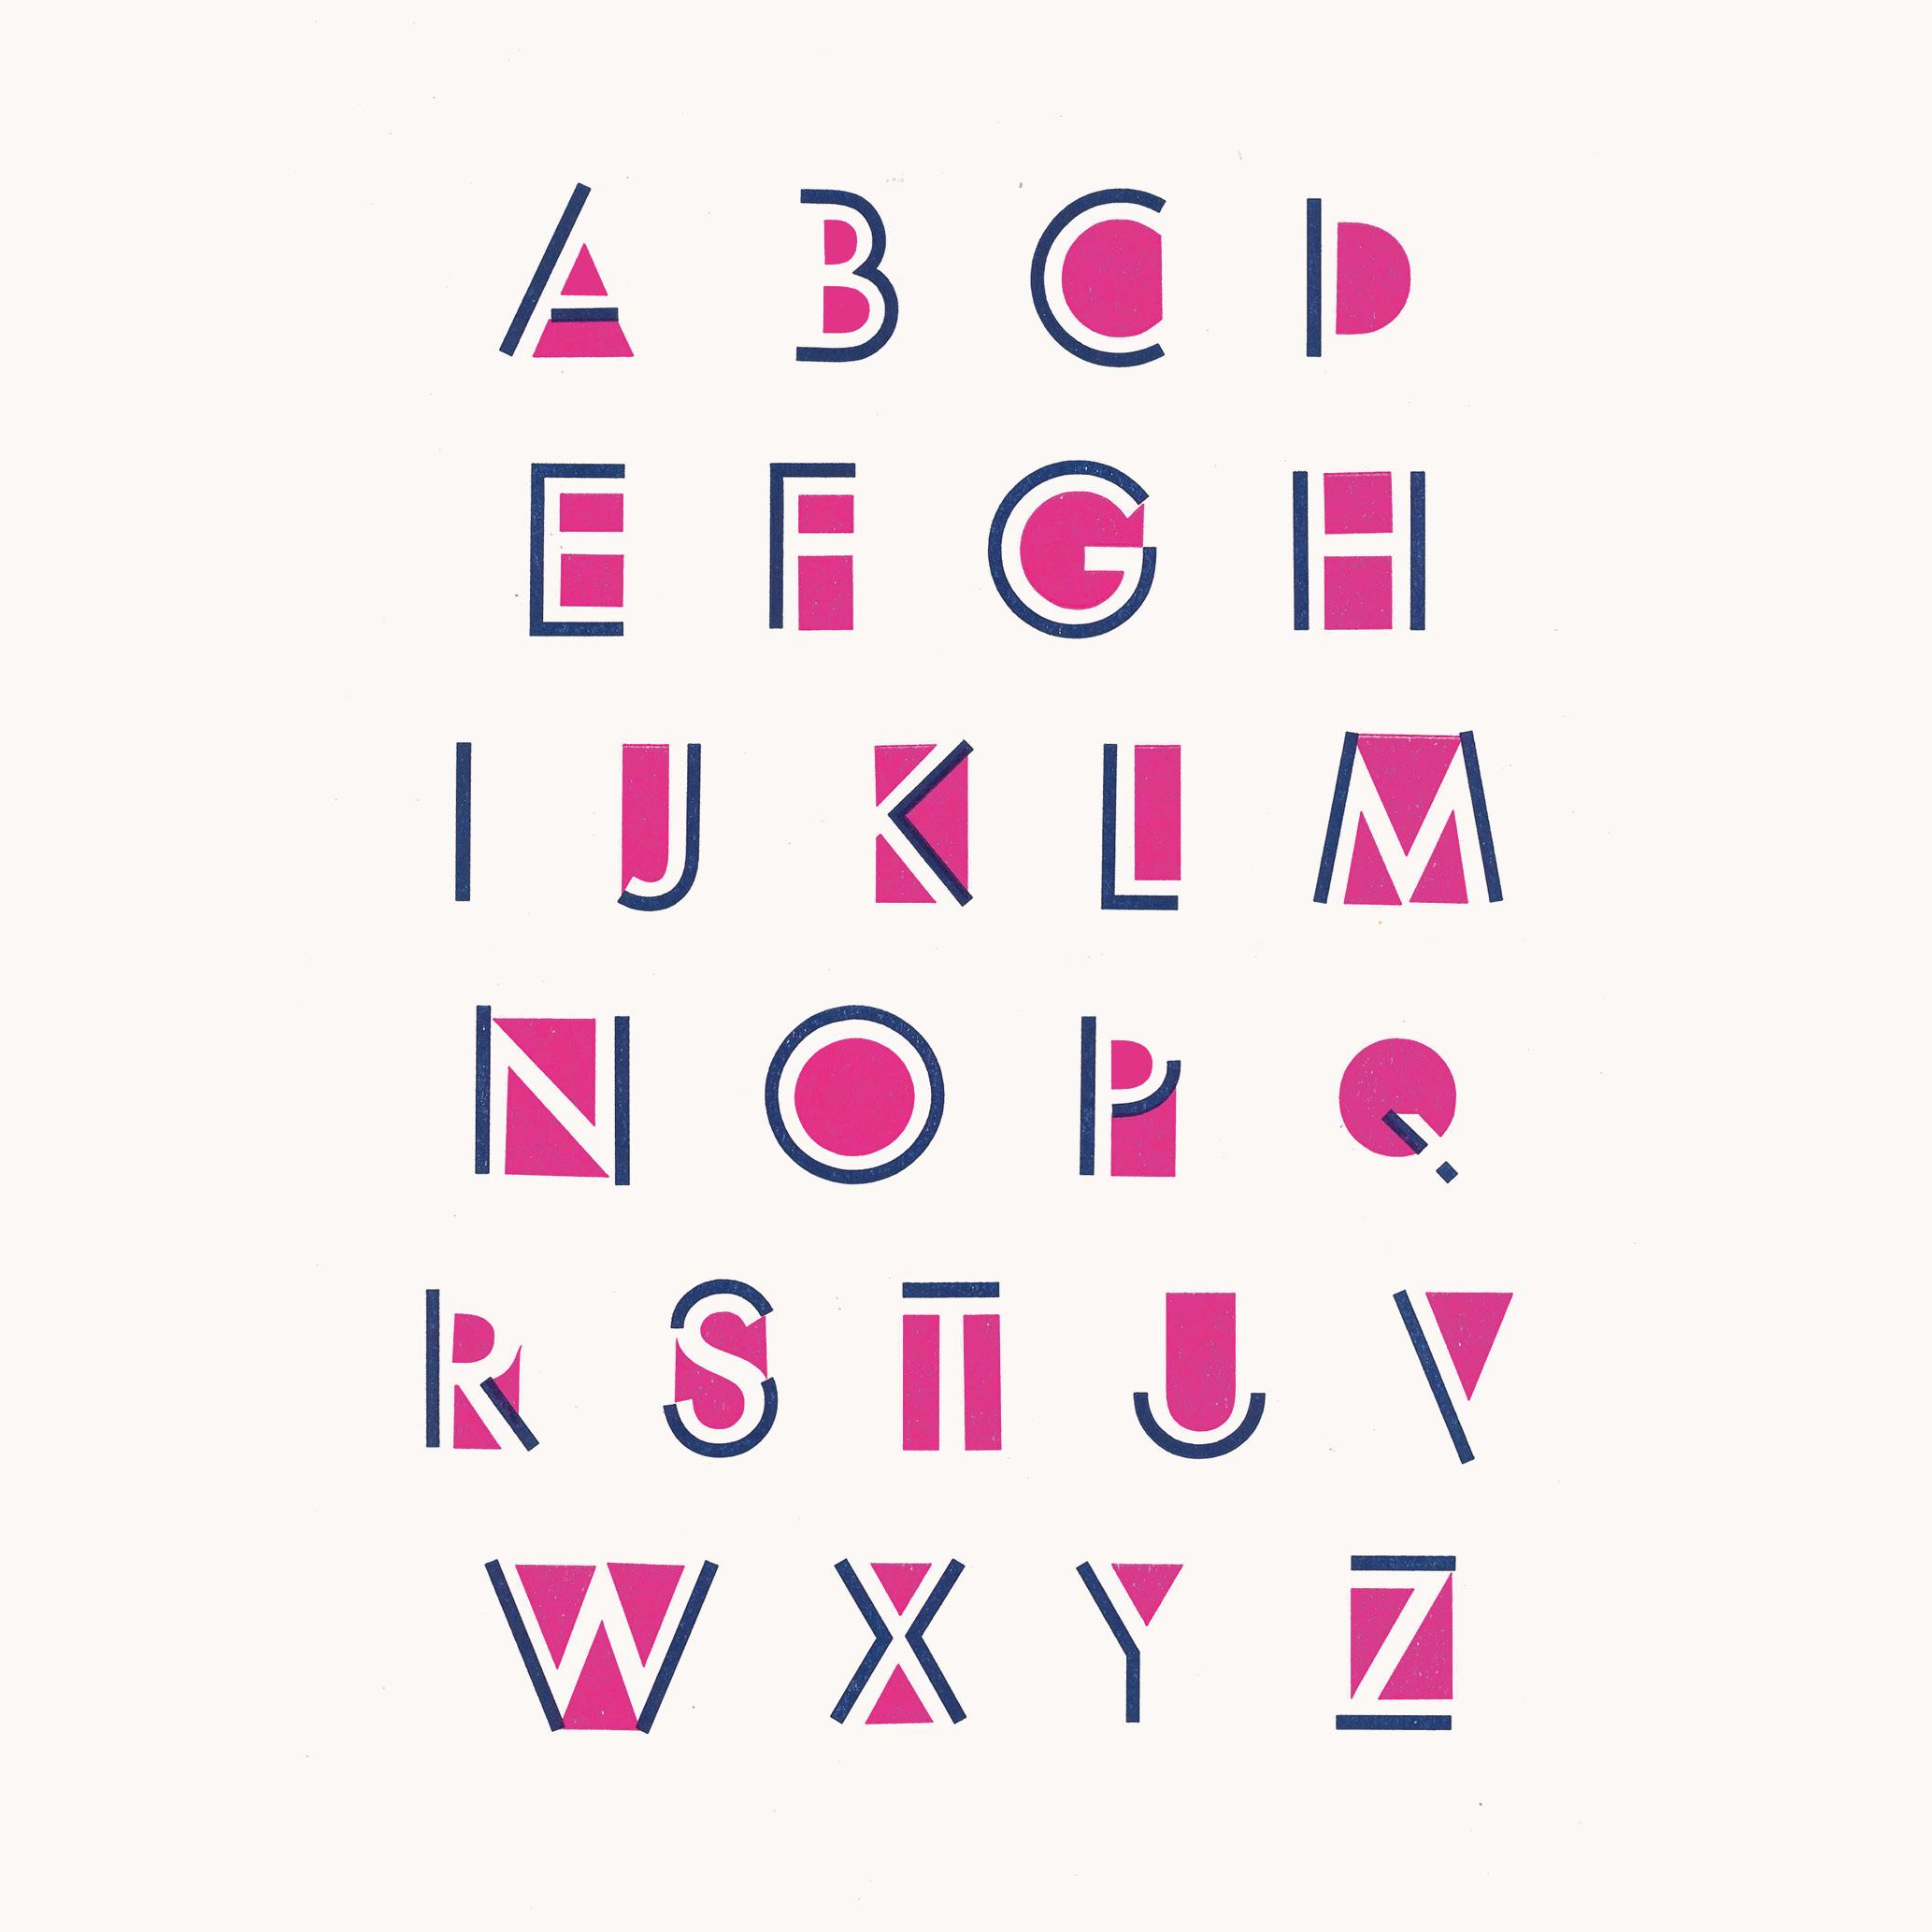 Counterform font.jpg